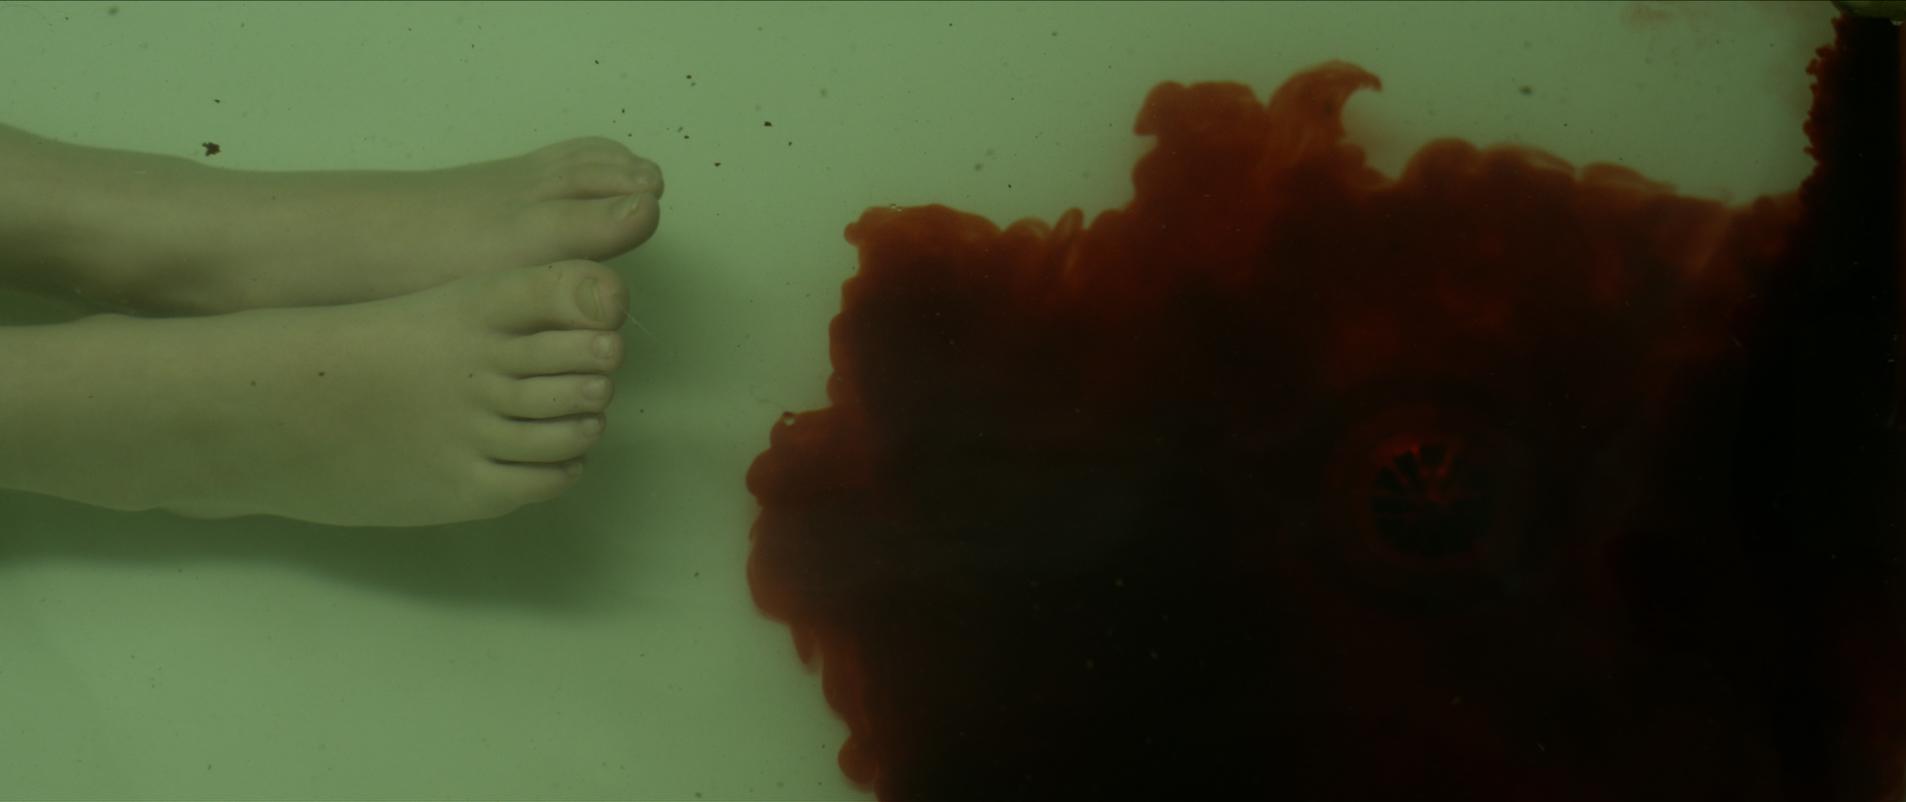 Blood spreading towards Coco's feet in bathtub water, supernatural.jpg